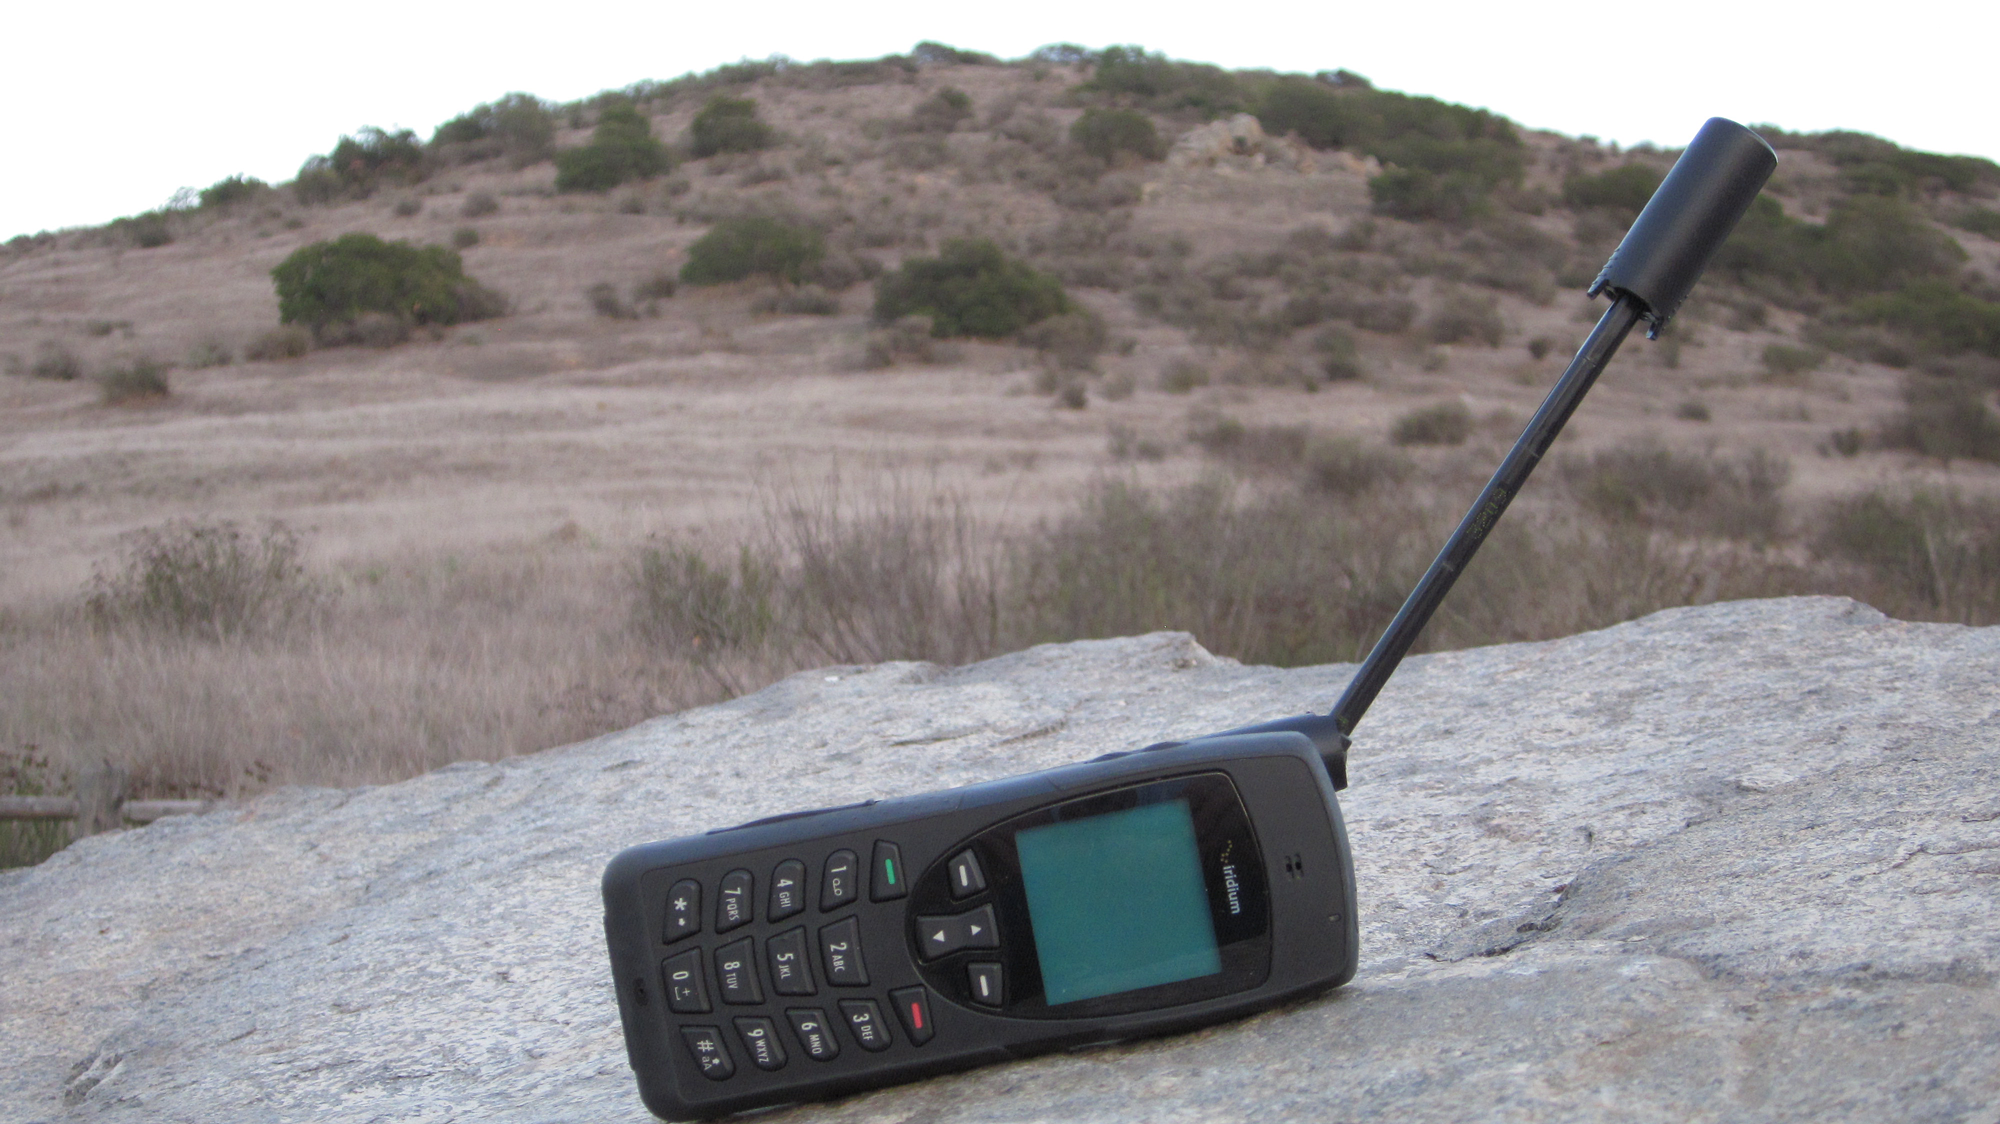 iridium-9555-sat-phone-in-a-mountain.png